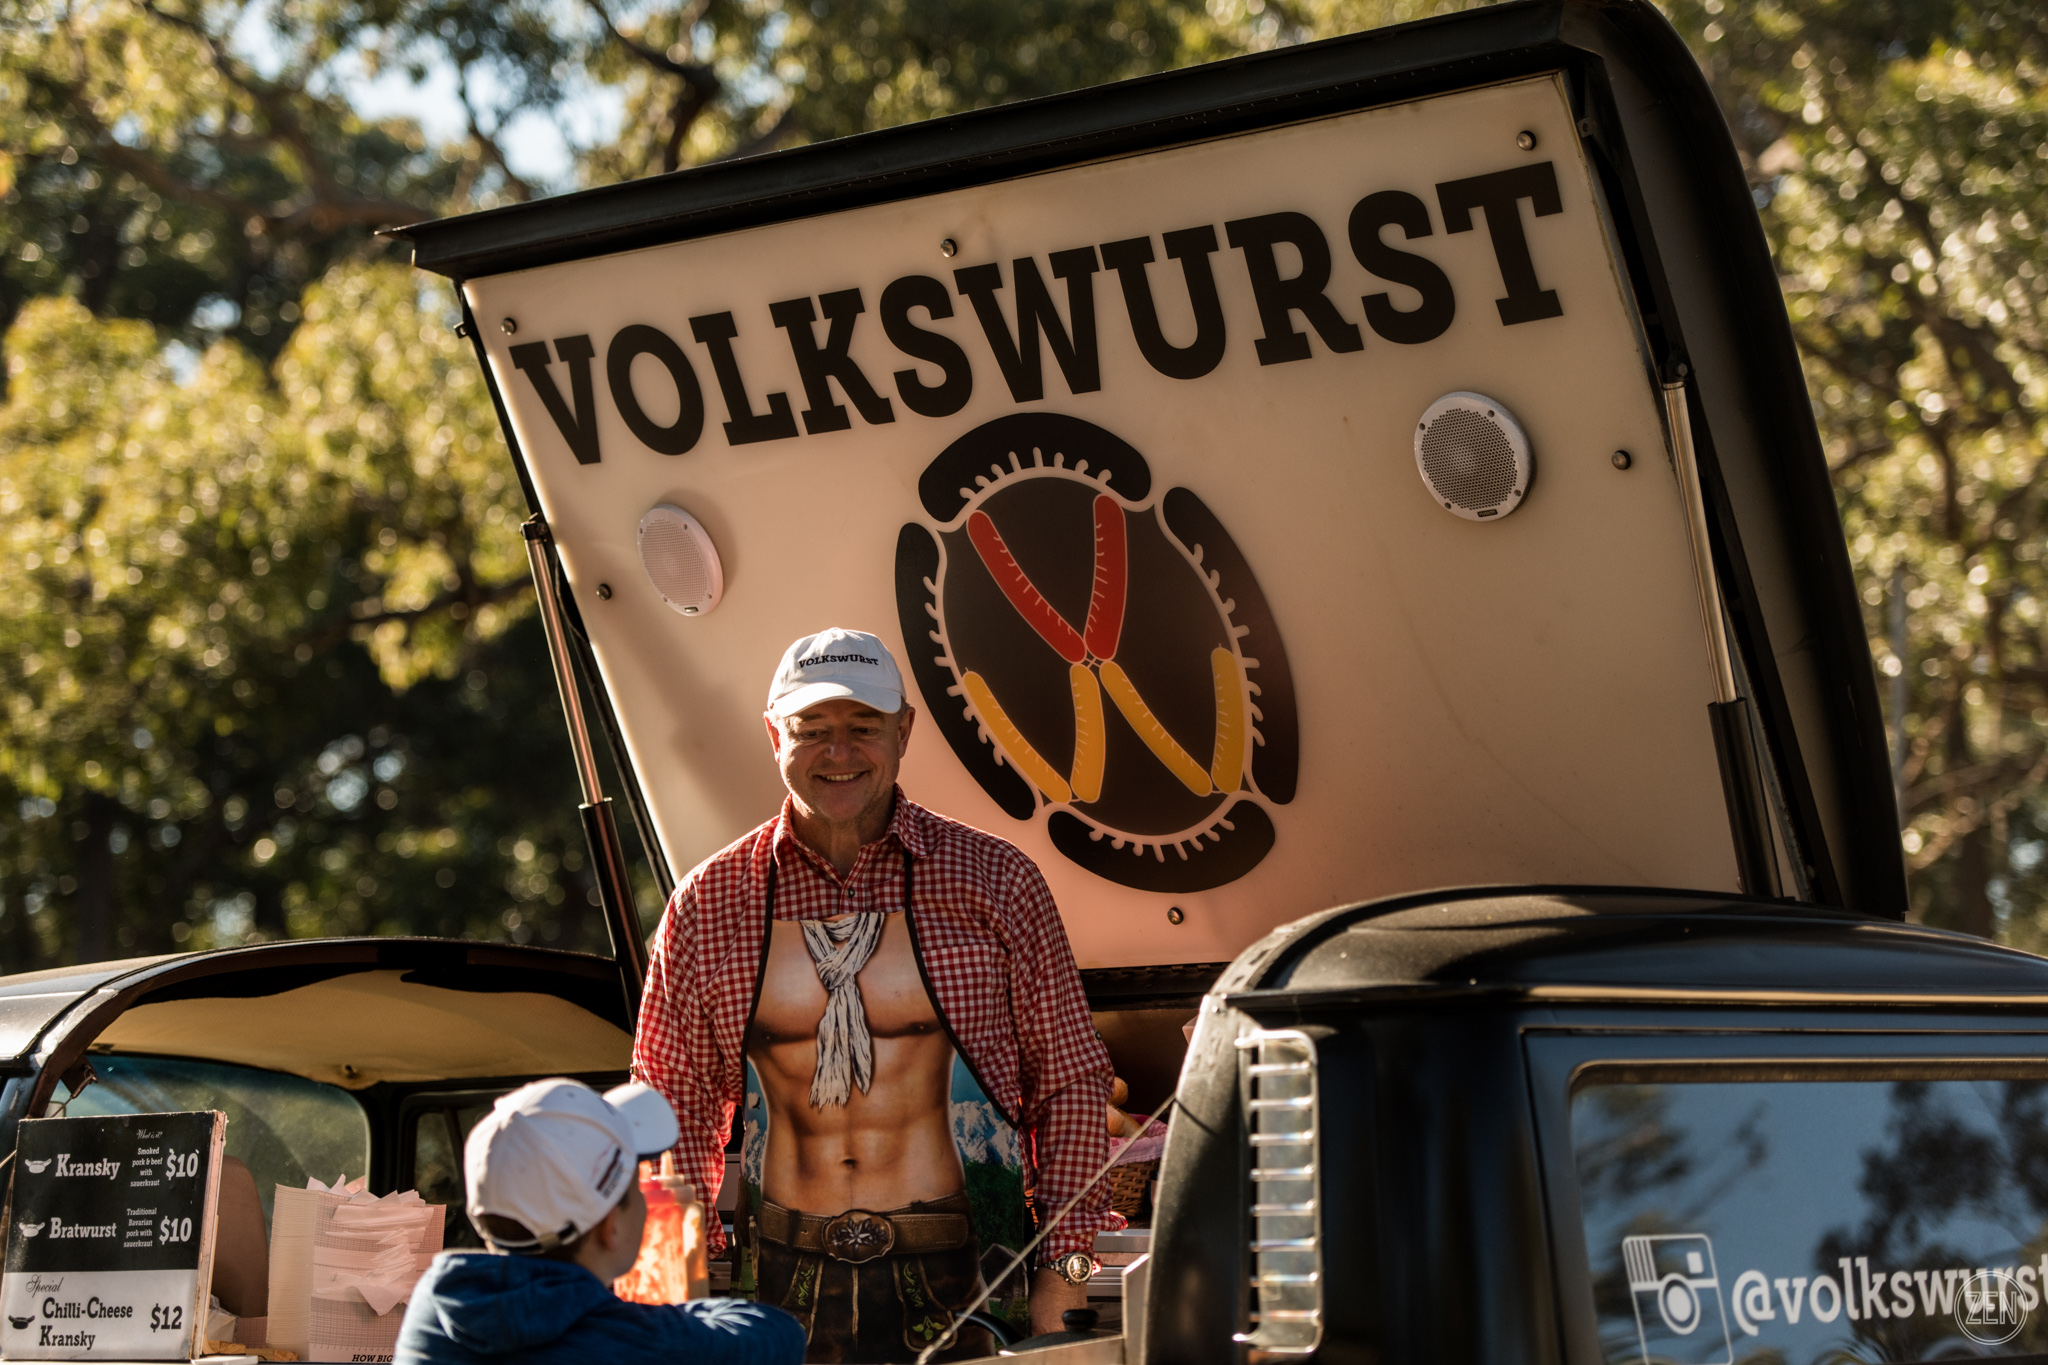 2019-07-21 - Autohaus Porches & Coffee 150